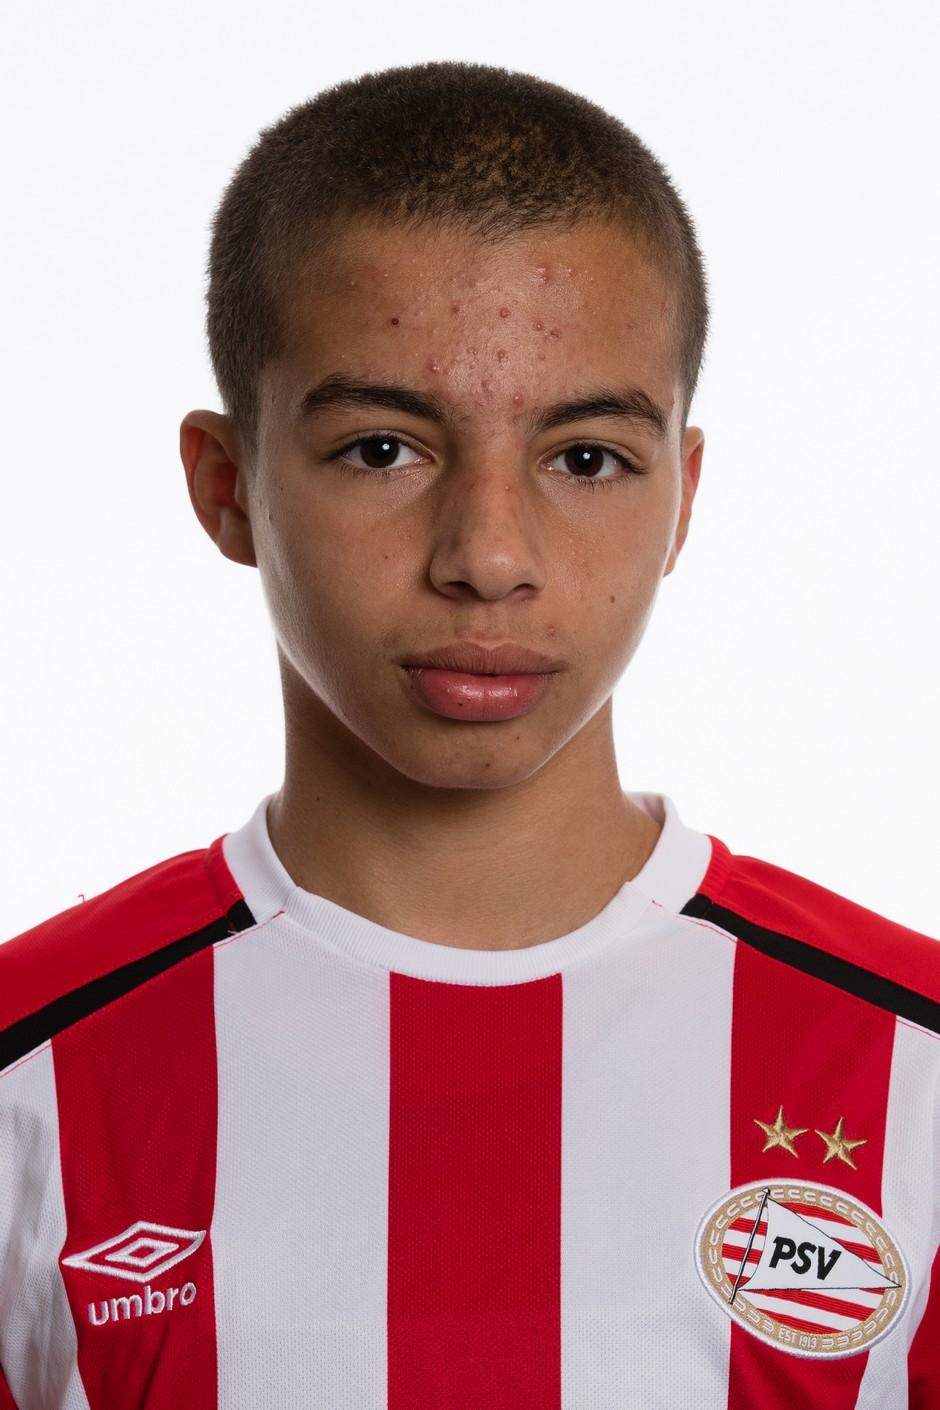 PSV O15 - 2016-2017